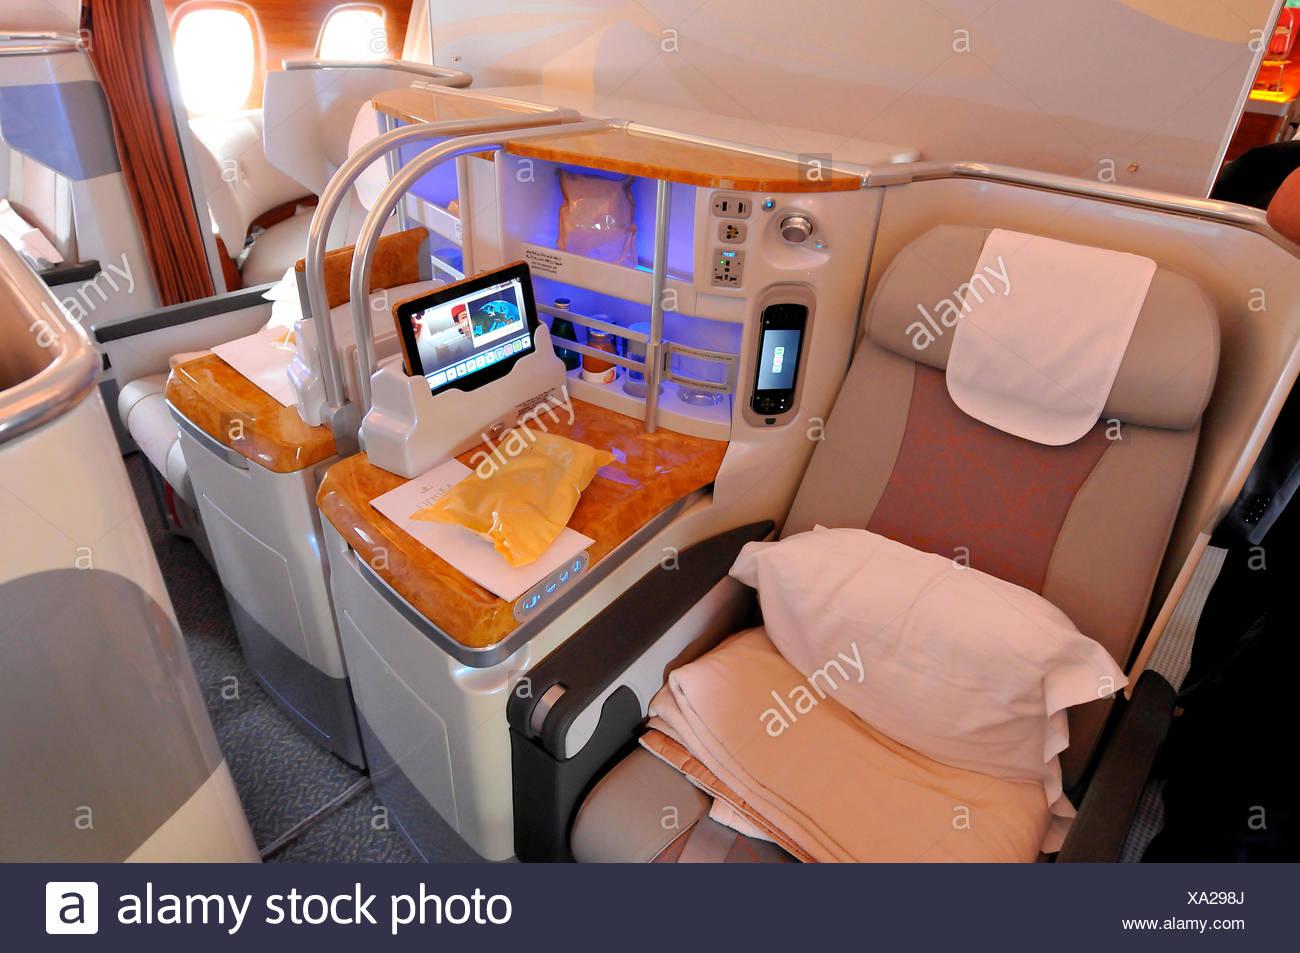 Sitz, Business-Klasse, Airbus A380, ILA, Berlin-Schönefeld, Deutschland Stockbild